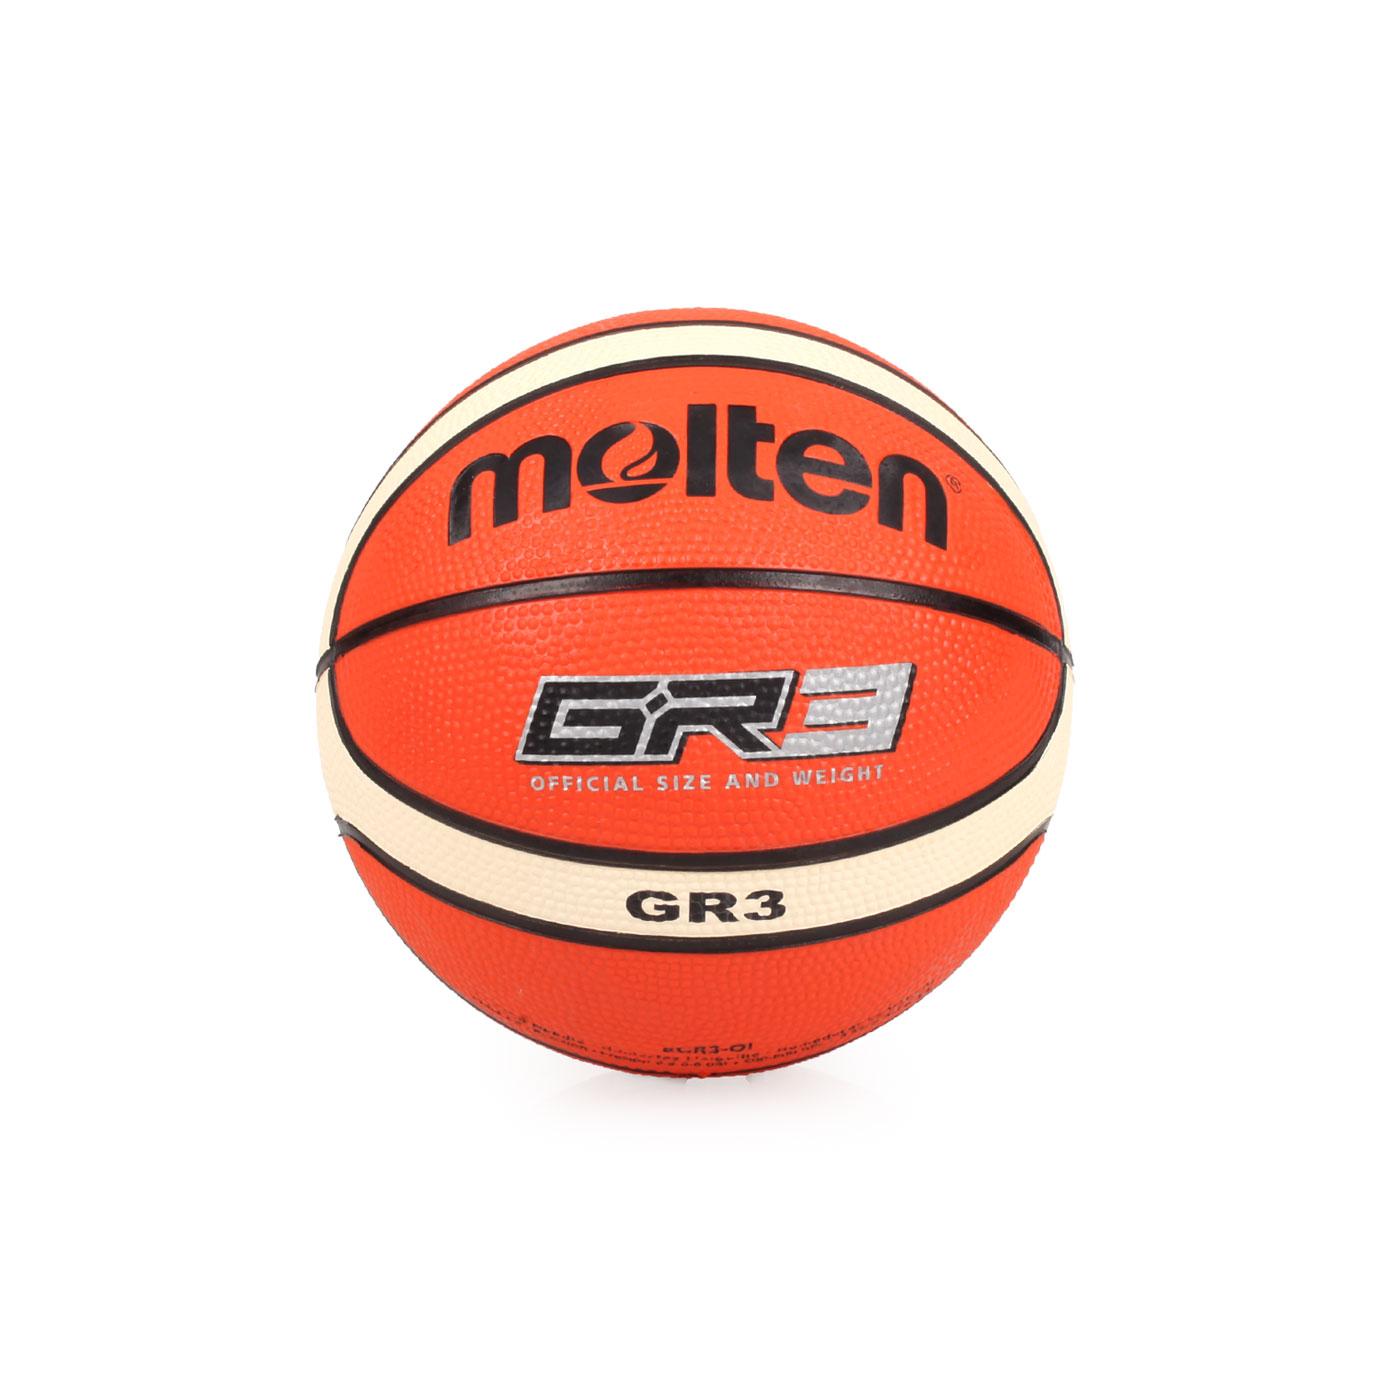 Molten 12片橡膠平溝籃球#3 BGR3-OI - 米白橘